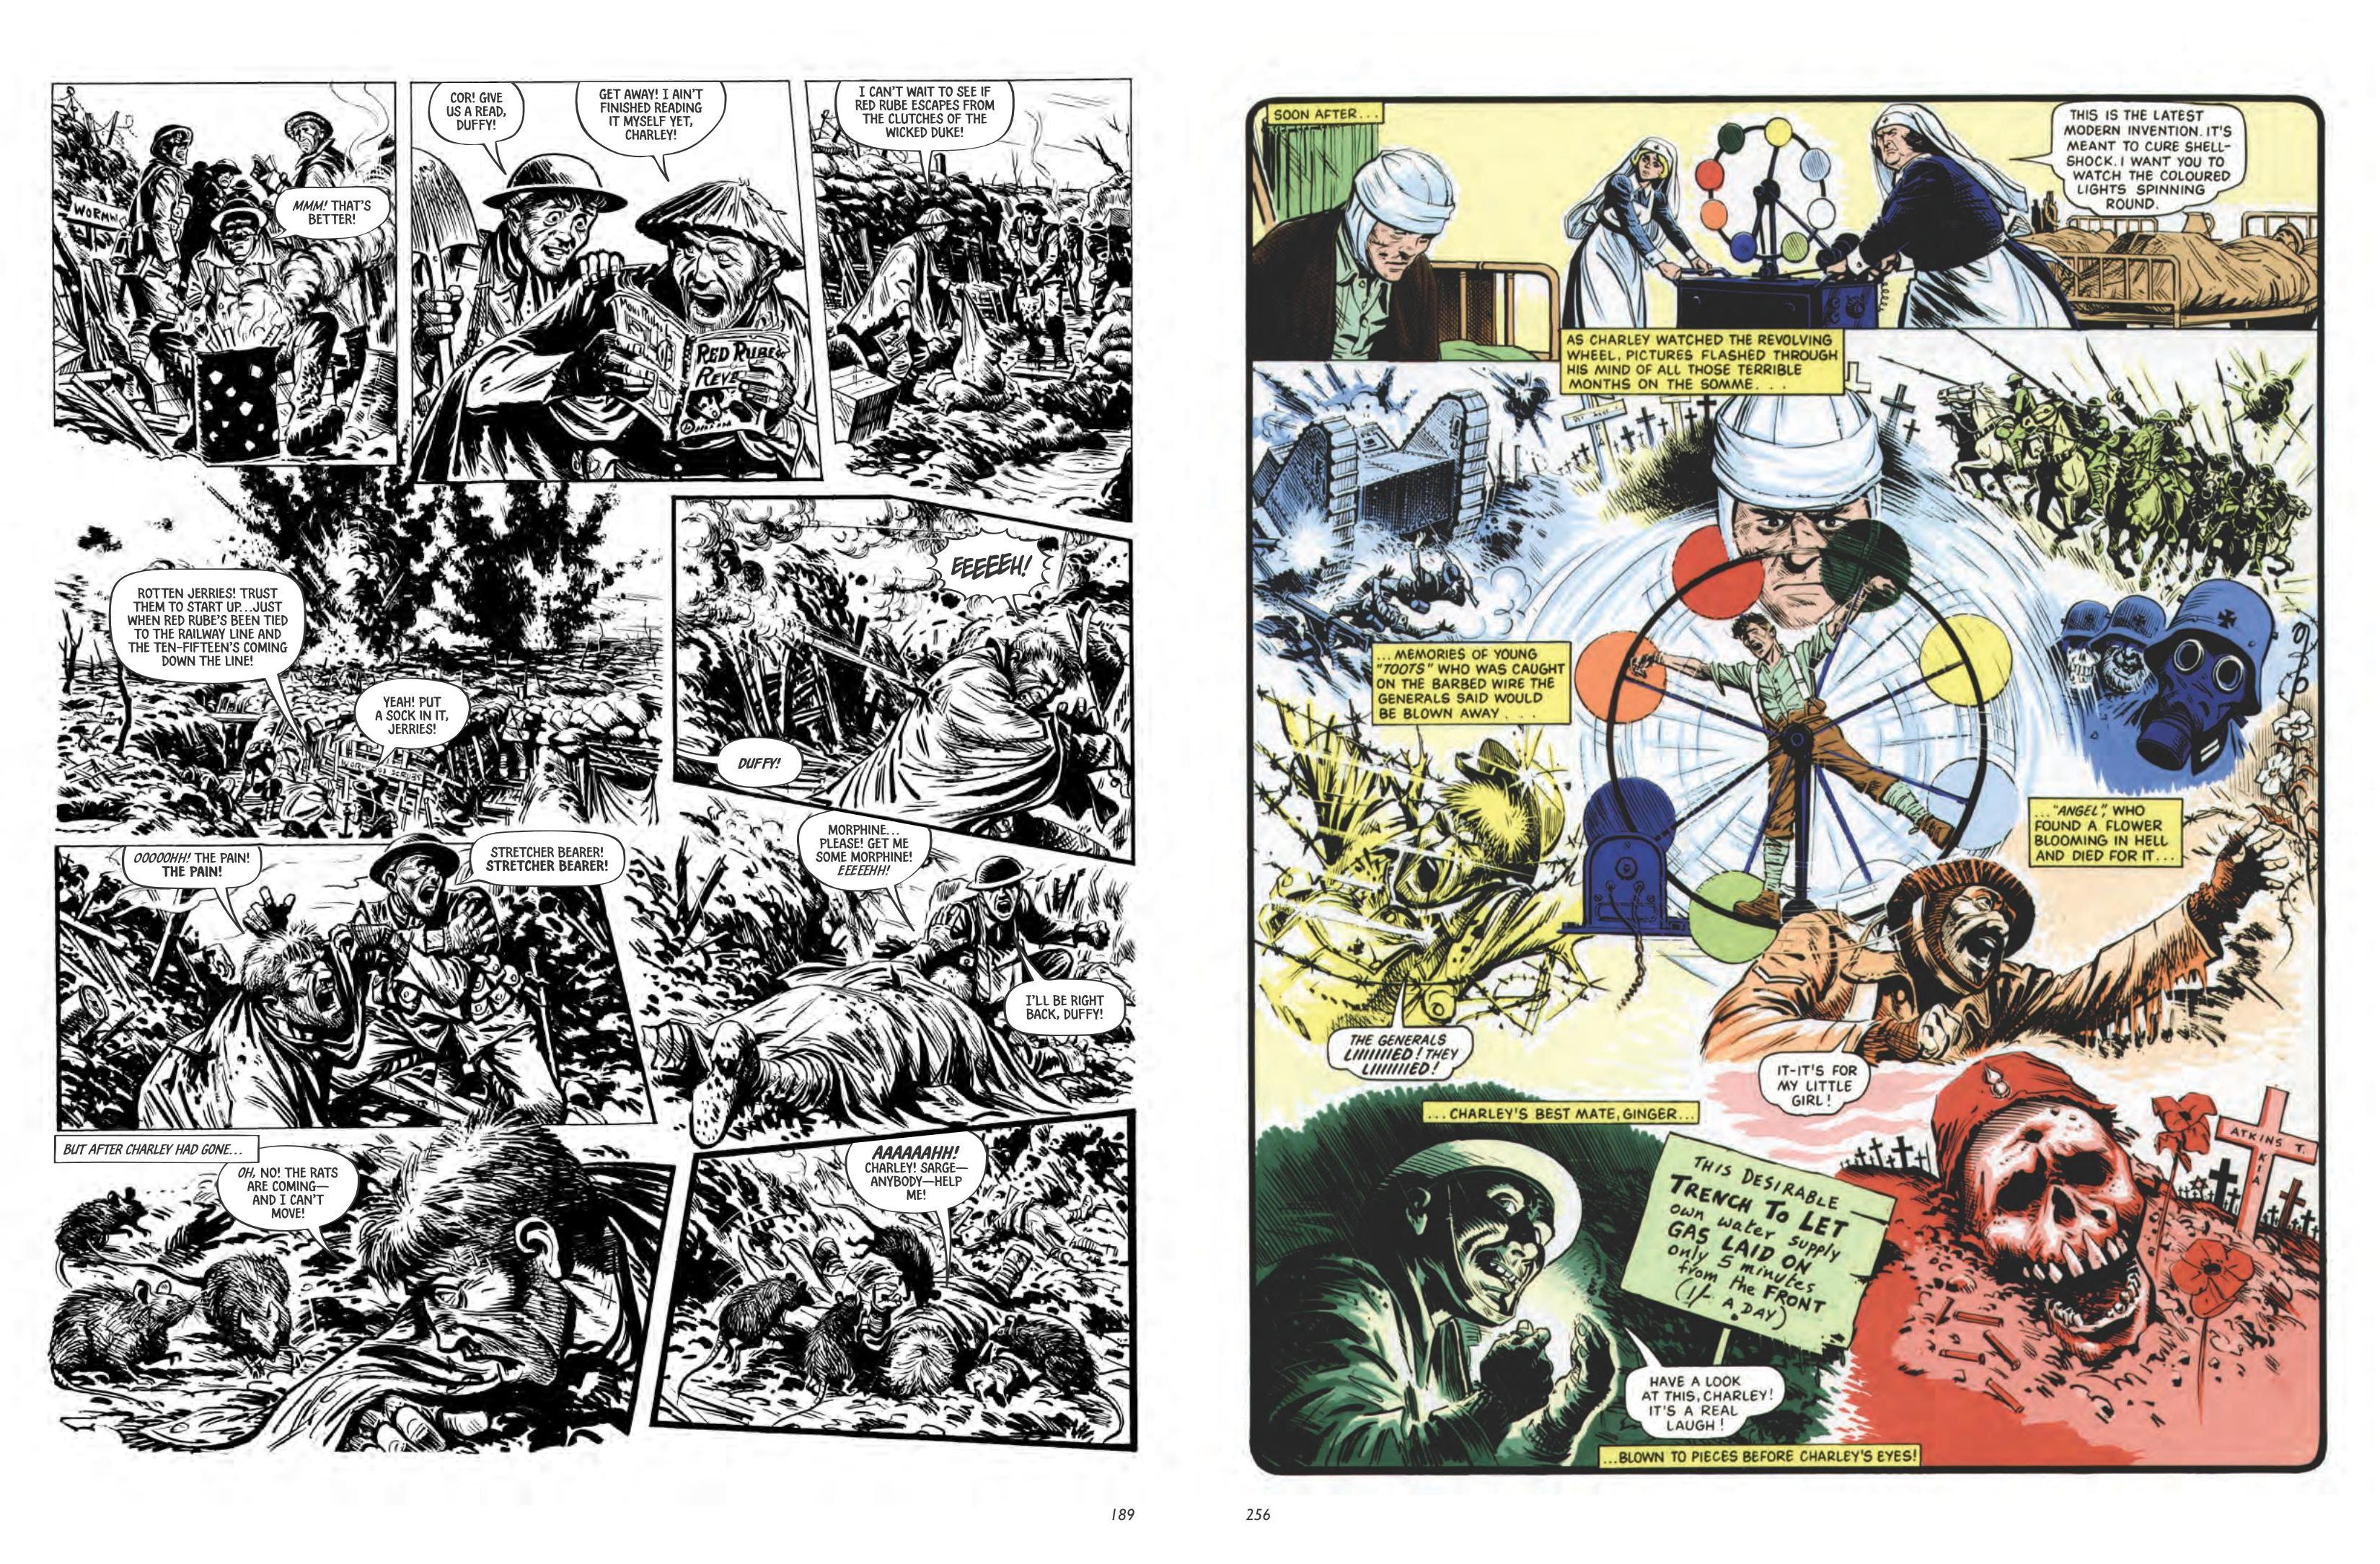 Charley's War Definitive Volume 1 Boy Soldier review